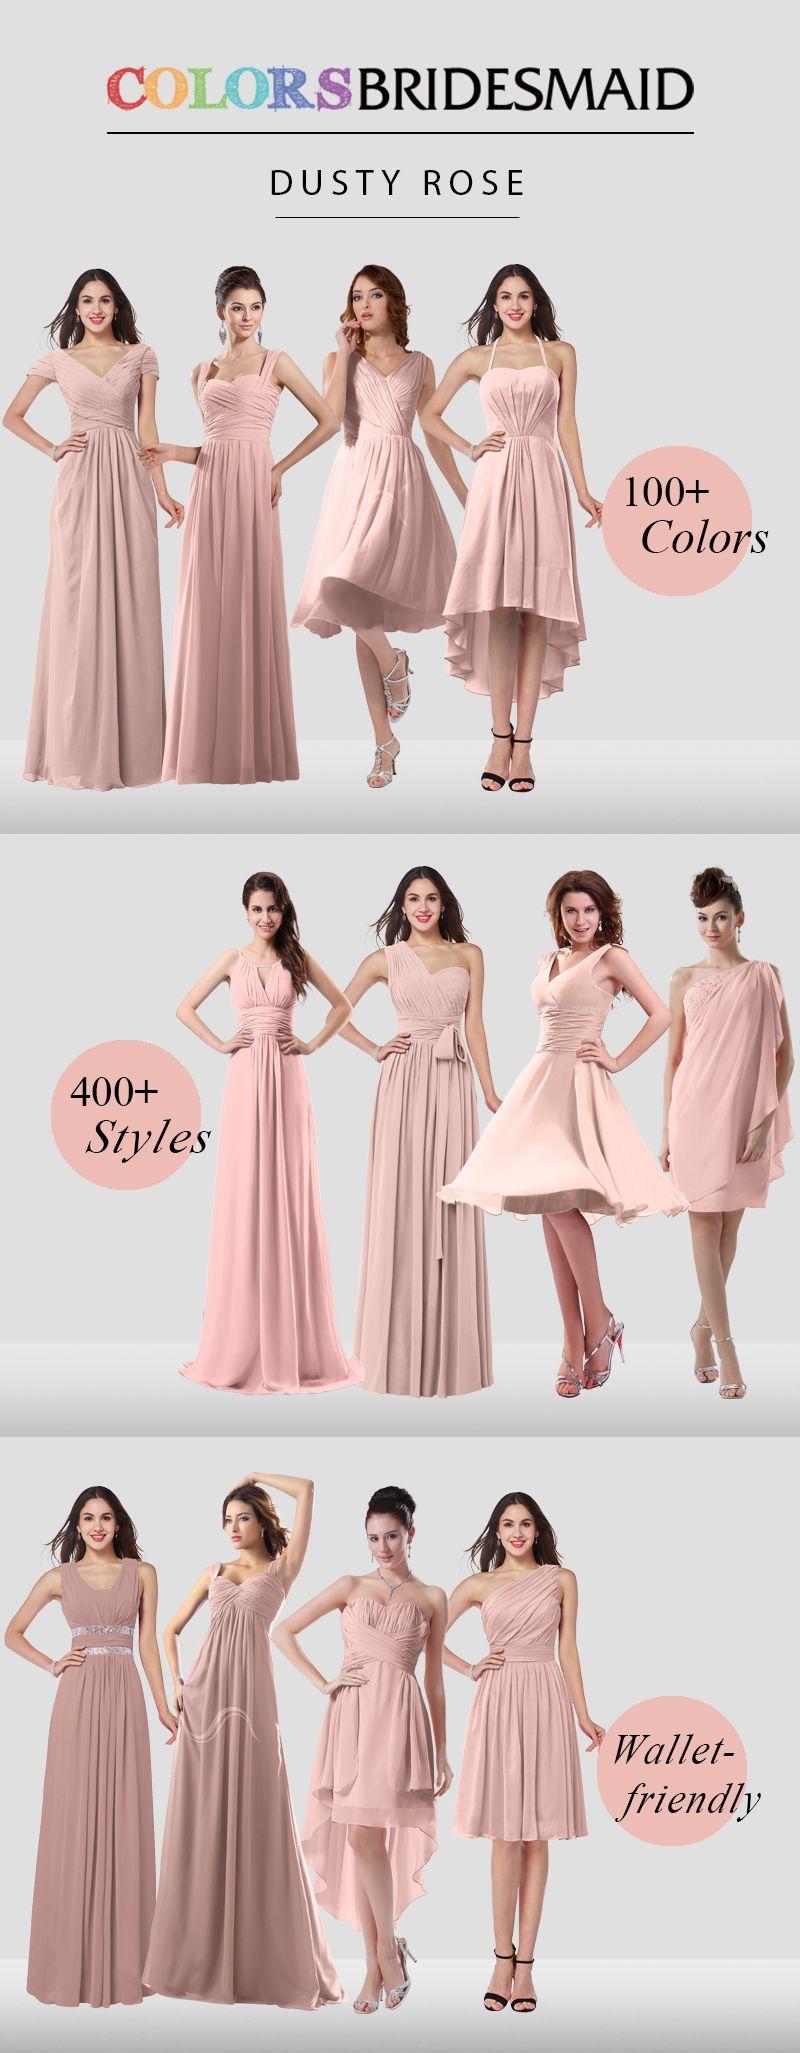 Dusty Rose Bridesmaid Dresses | Pinterest | Damas, Vestidos de dama ...